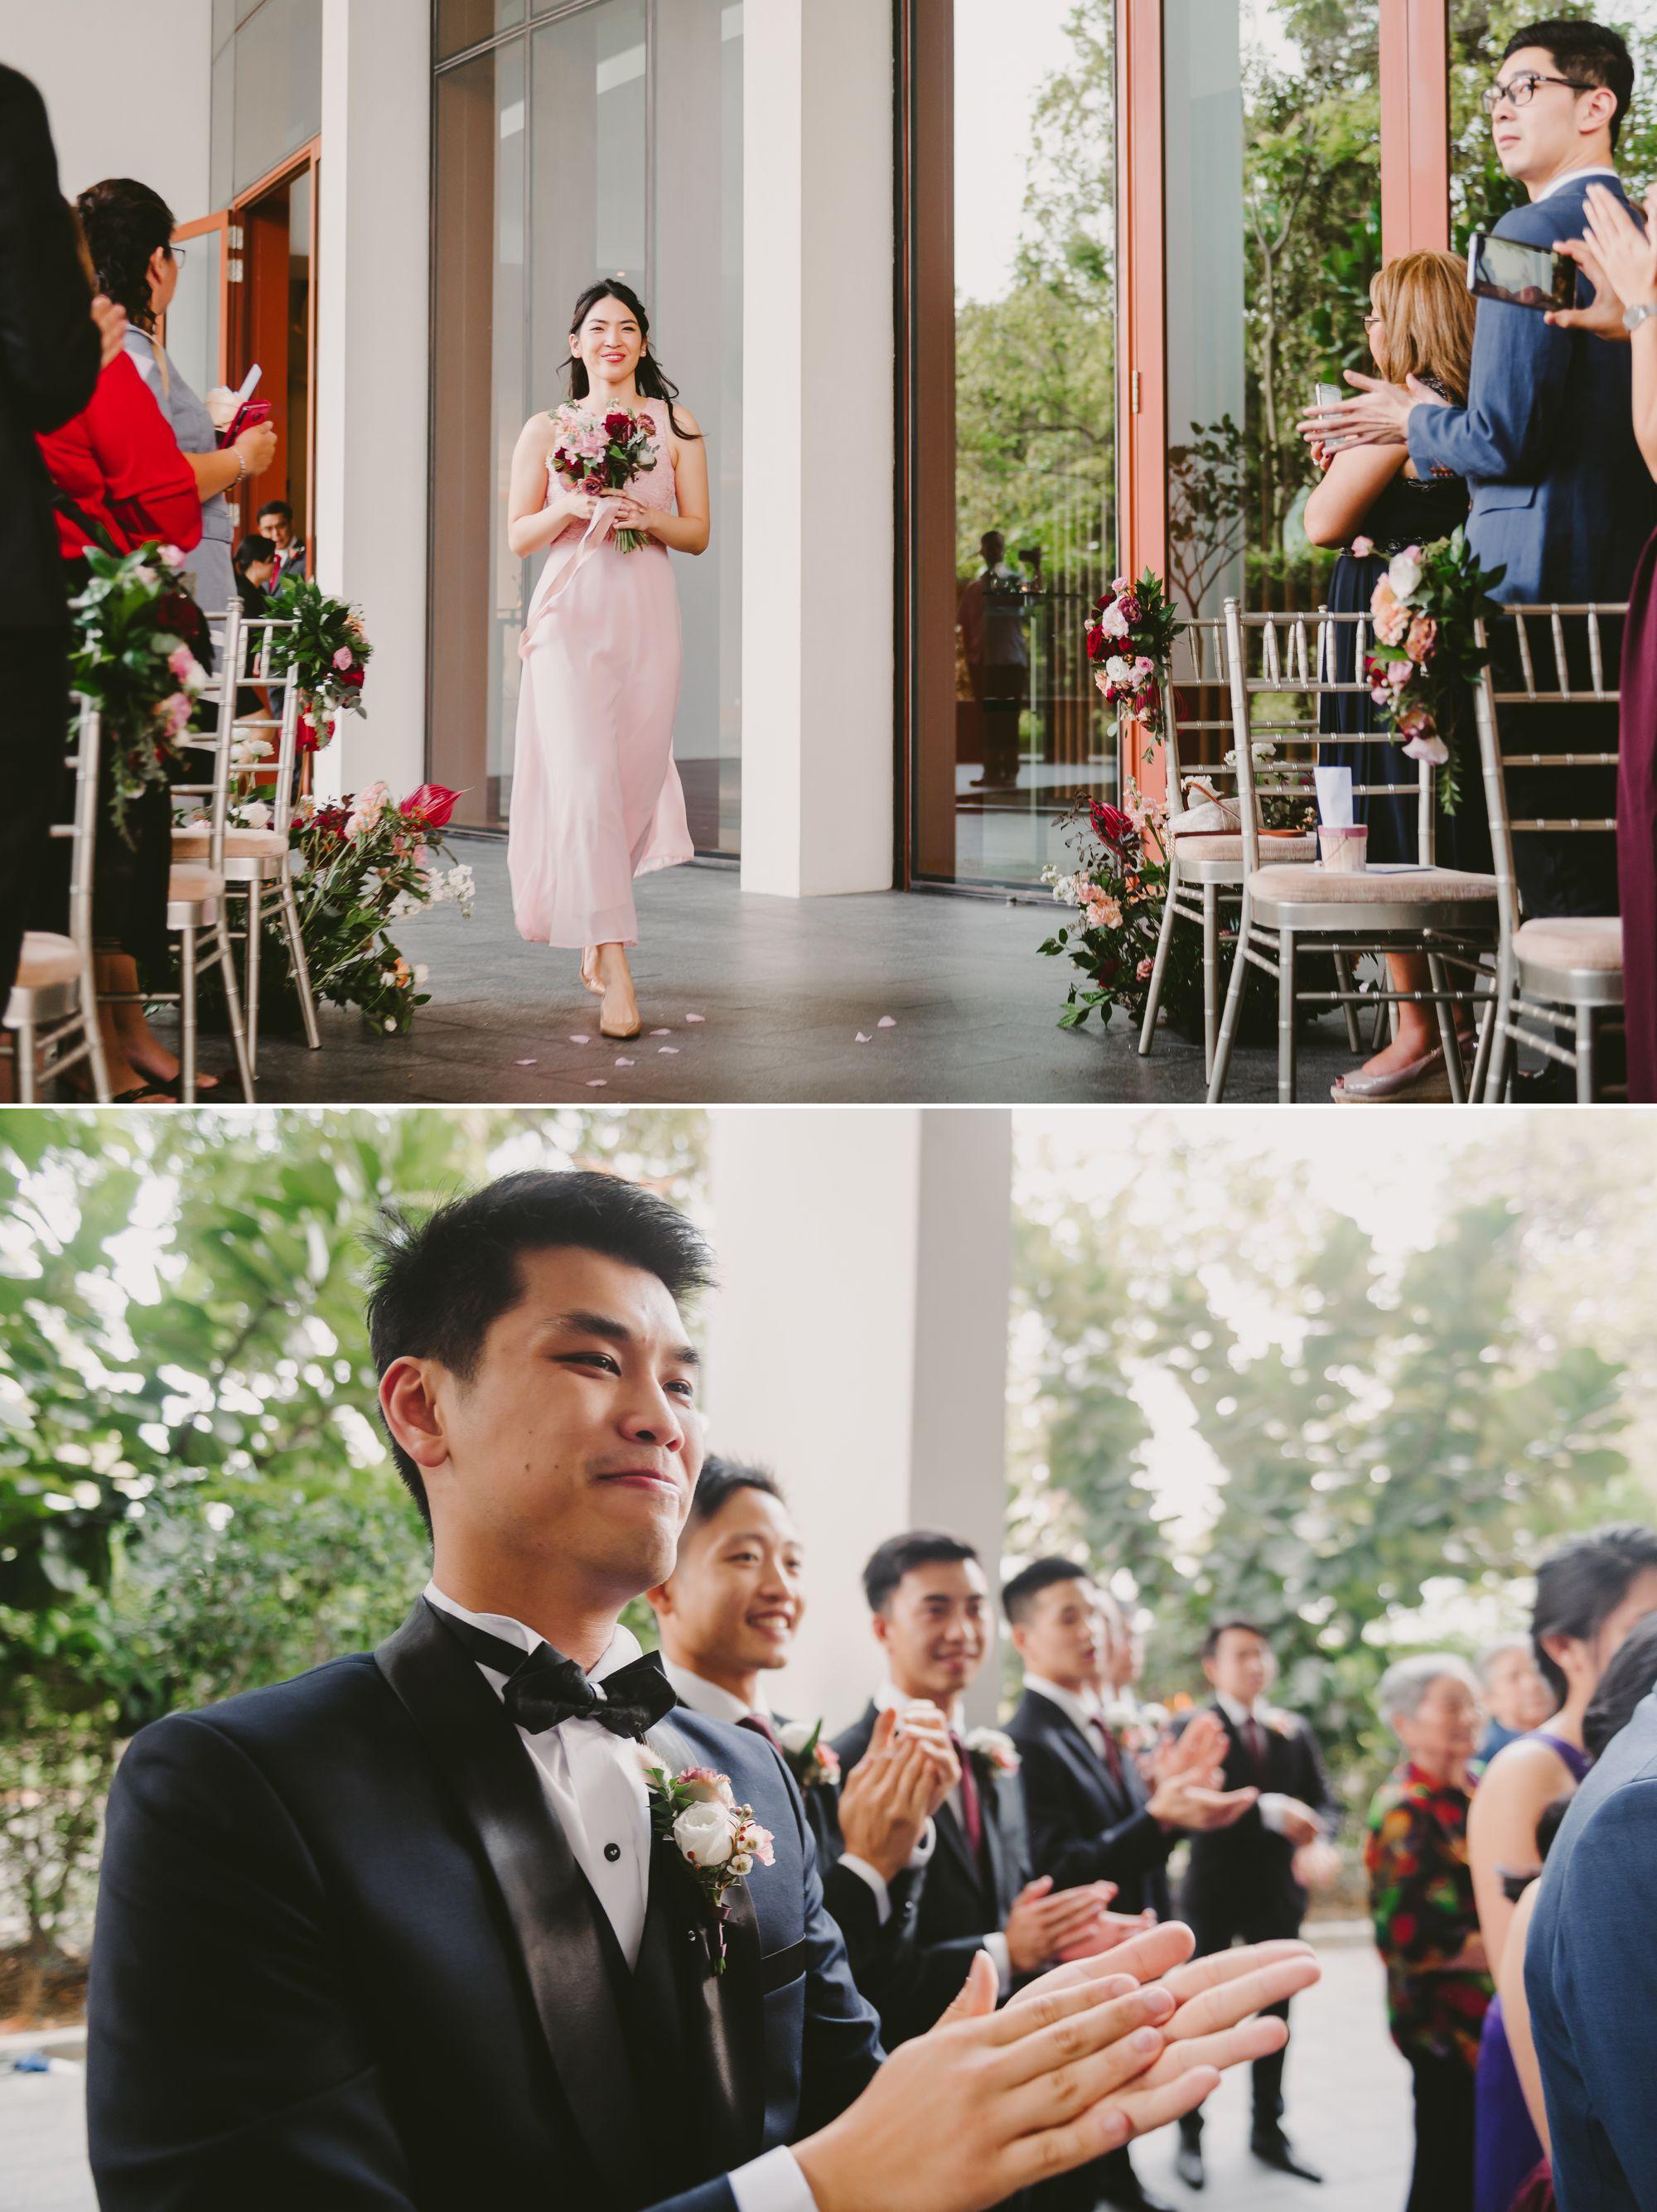 capella_wedding_photography_ 41.jpg